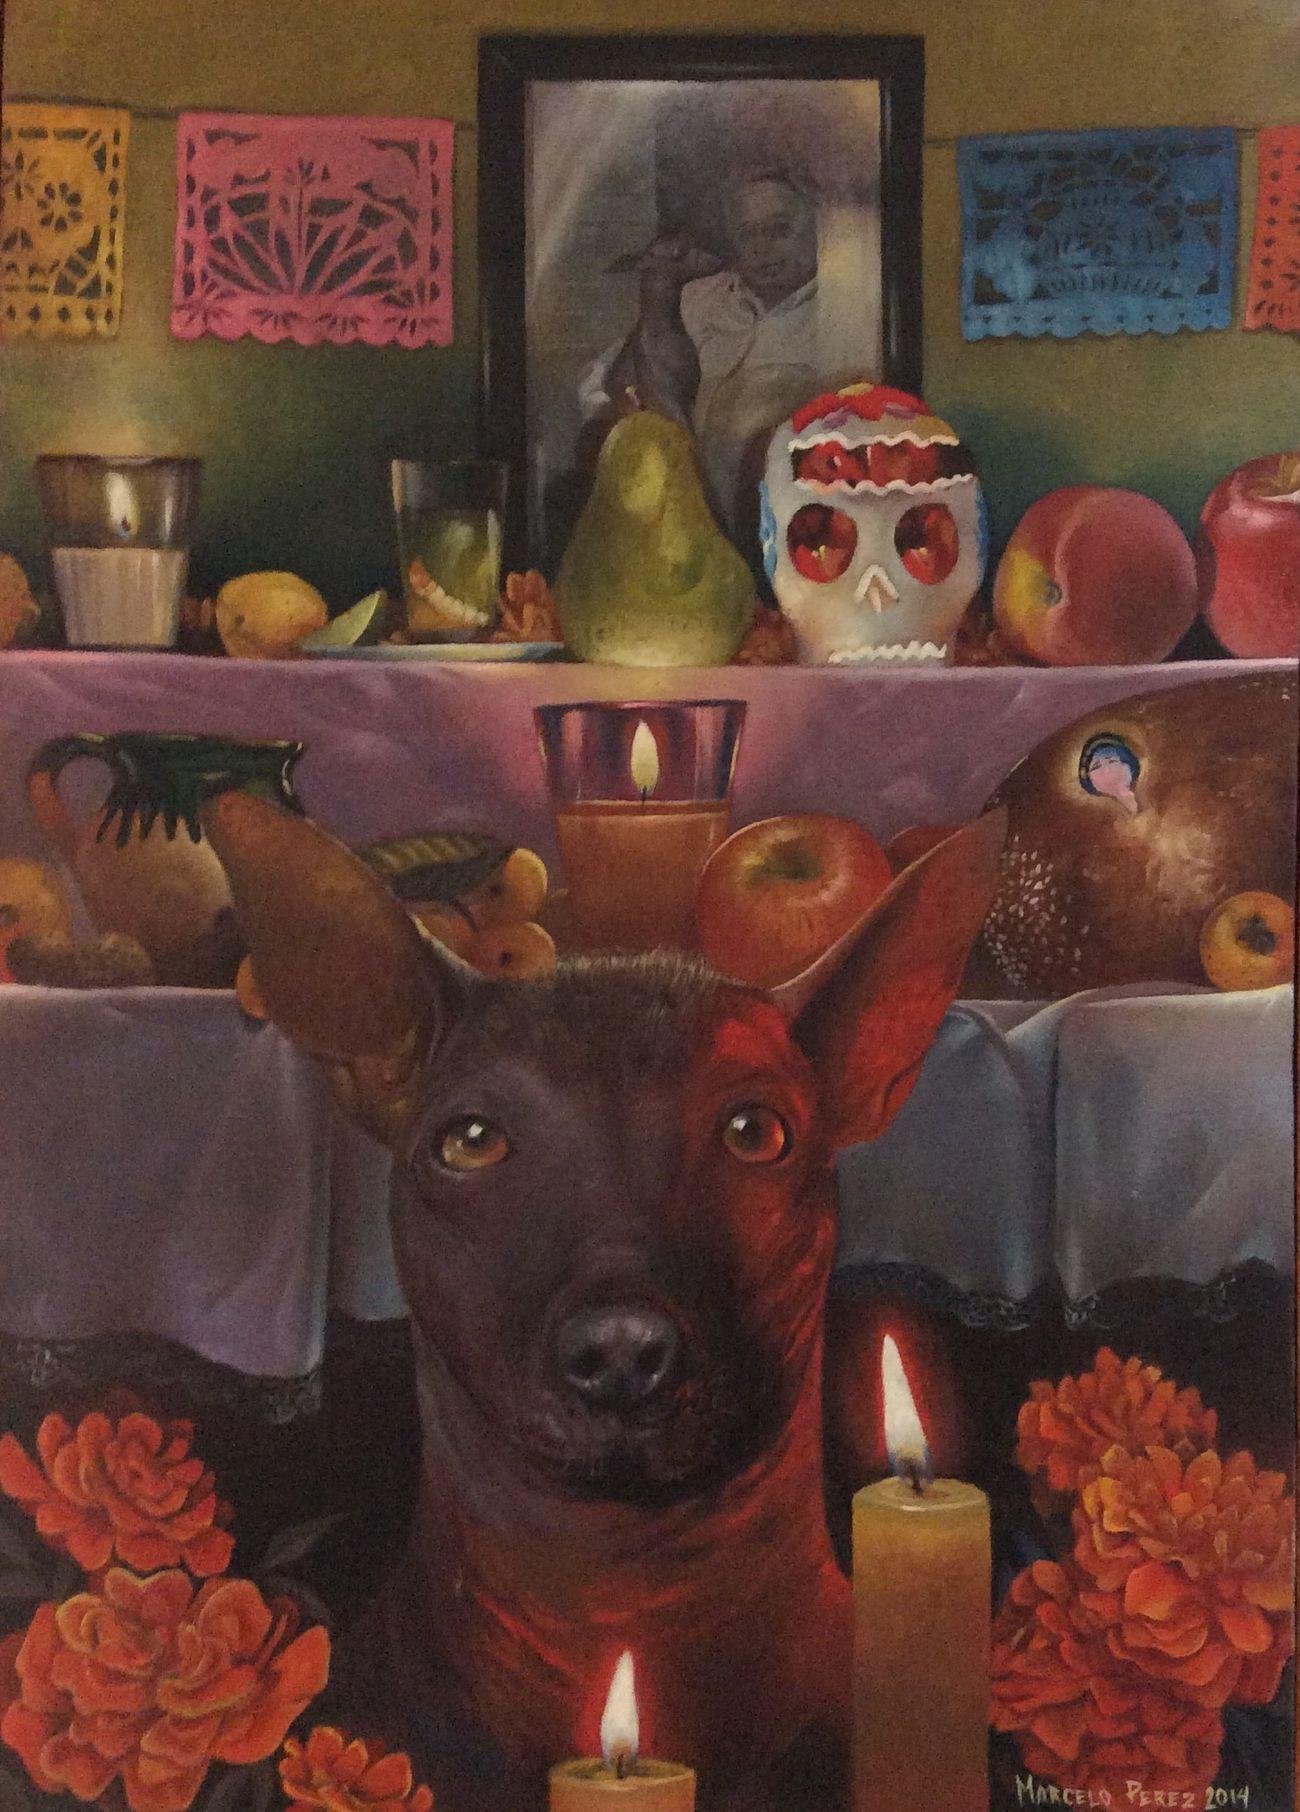 Obra de Marcelo Perez Oil Painting Terracota Arte Actual Art Gallery Art Oaxaca Yucatan Mexico